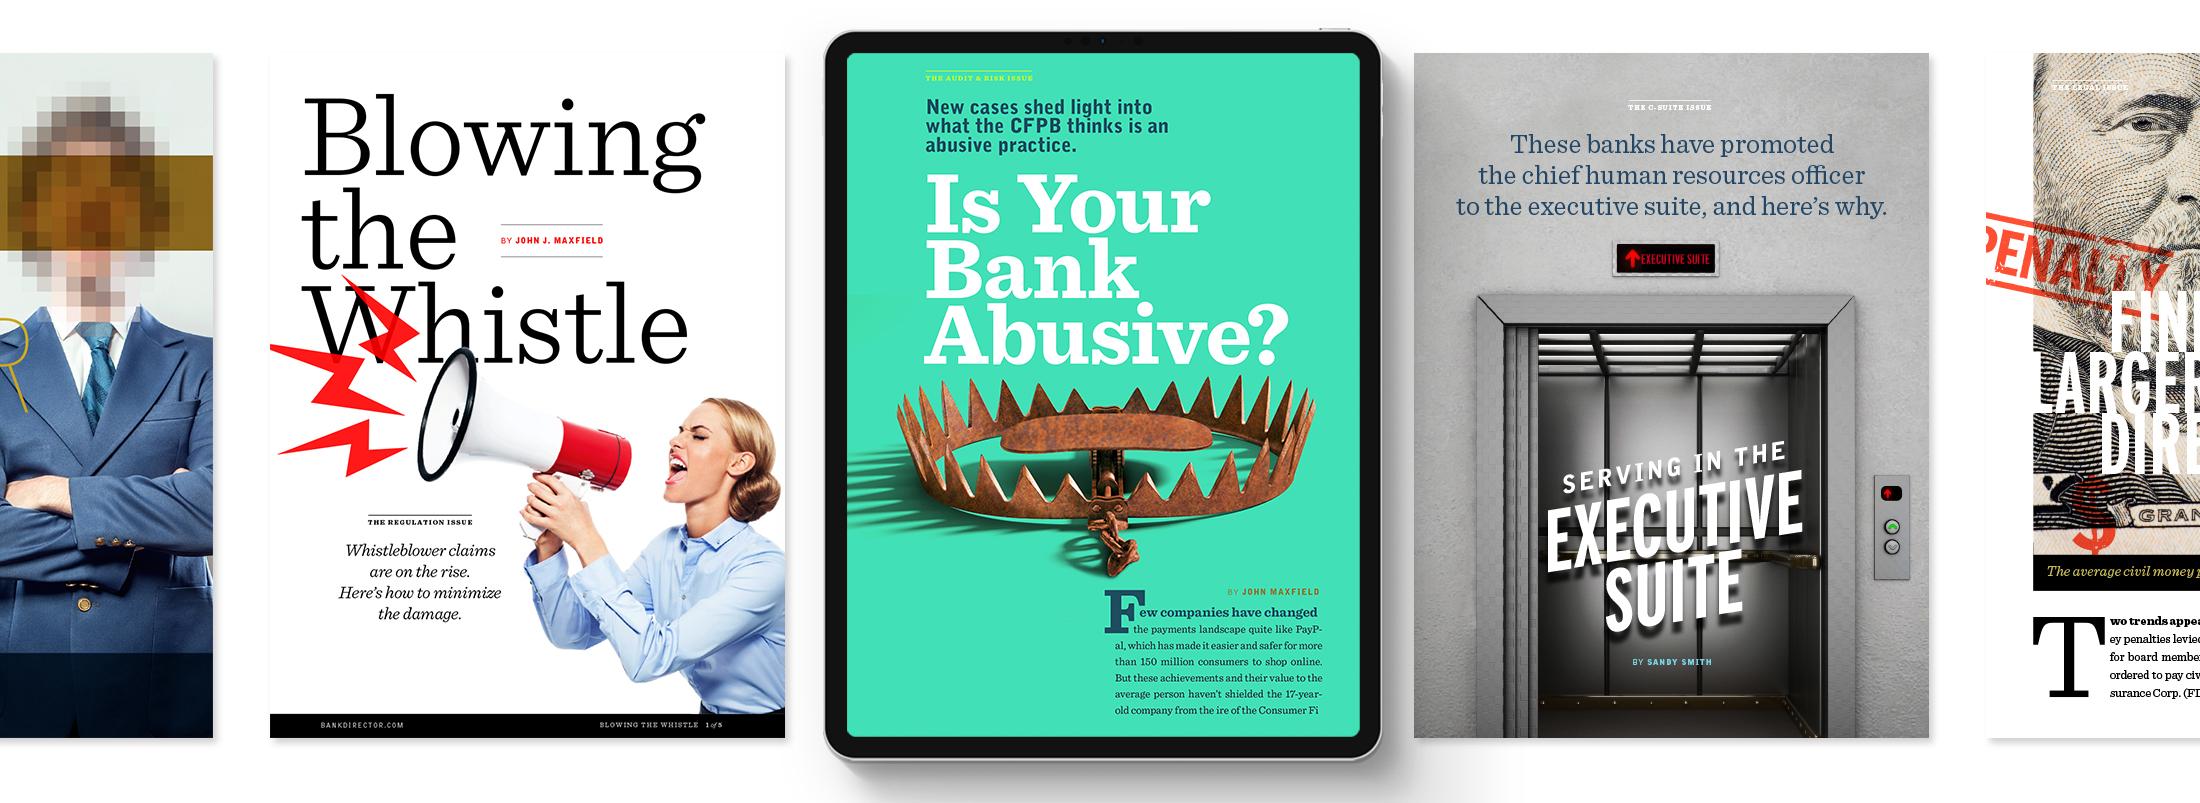 Bank Director Digital Magazine examples row 2 © Robertson Design